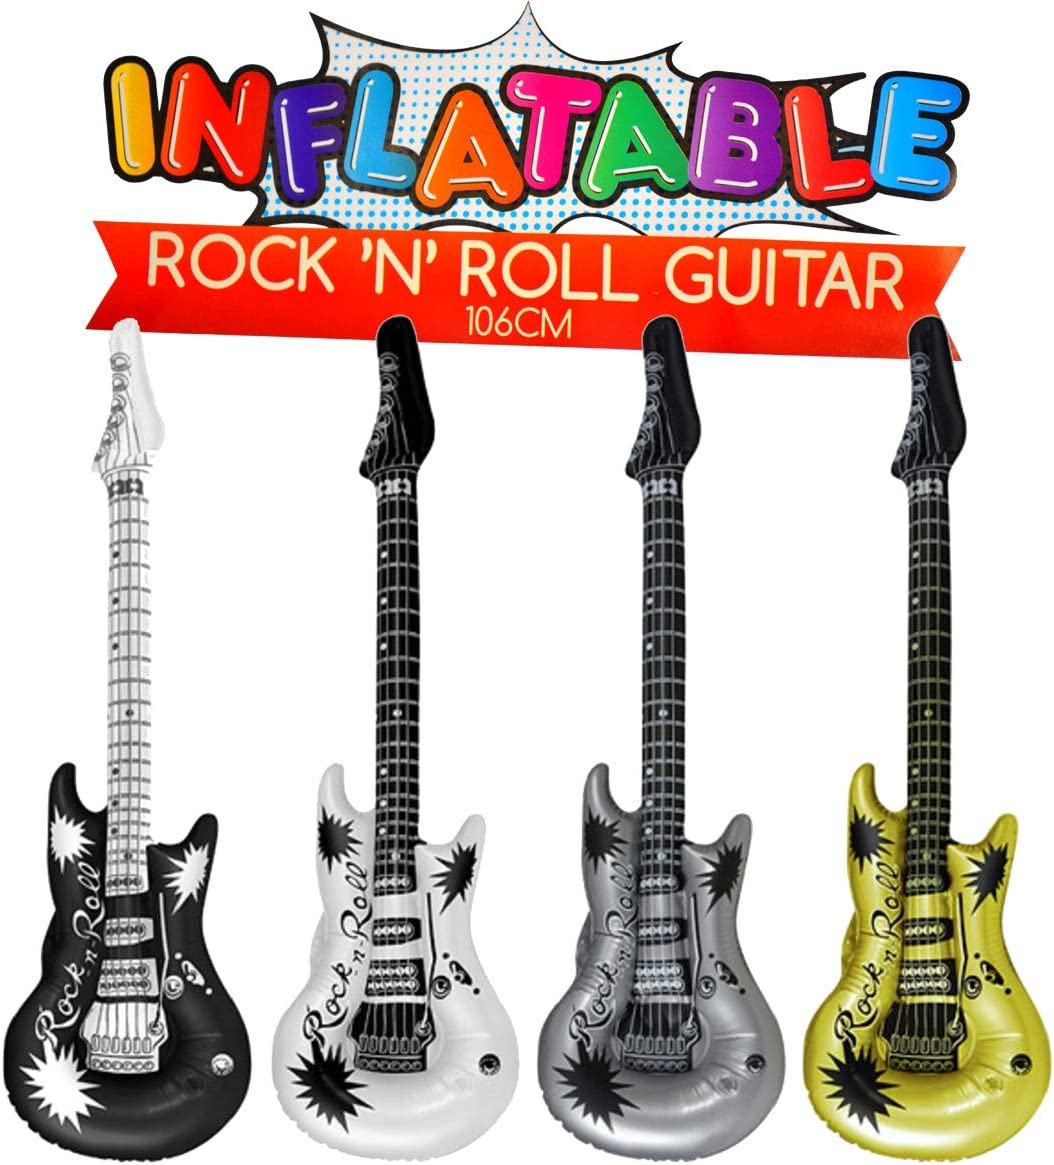 Henbrandt the Harlequin Brand 4X Aufblasbare Gitarre Luftgitarre Rock n Roll ca.106cm Metallic Wasser Party Deko Aufblasdeko